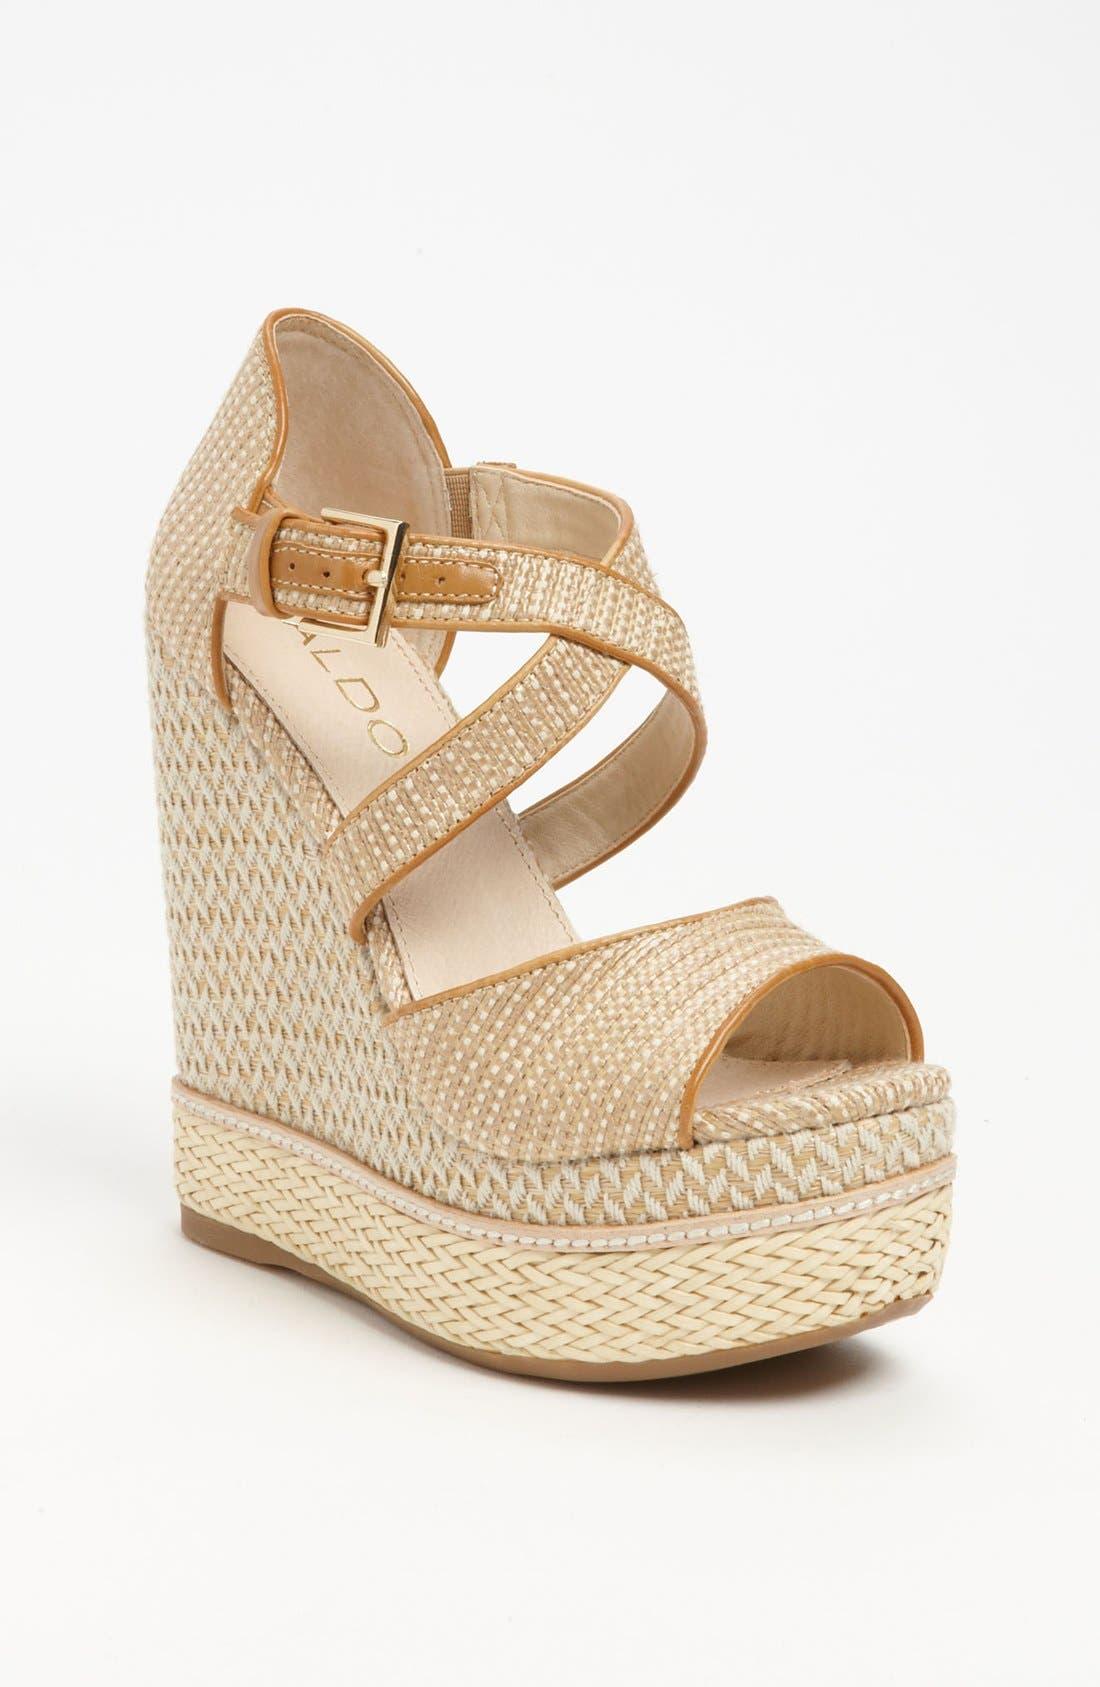 Alternate Image 1 Selected - ALDO 'Deitch' Sandal